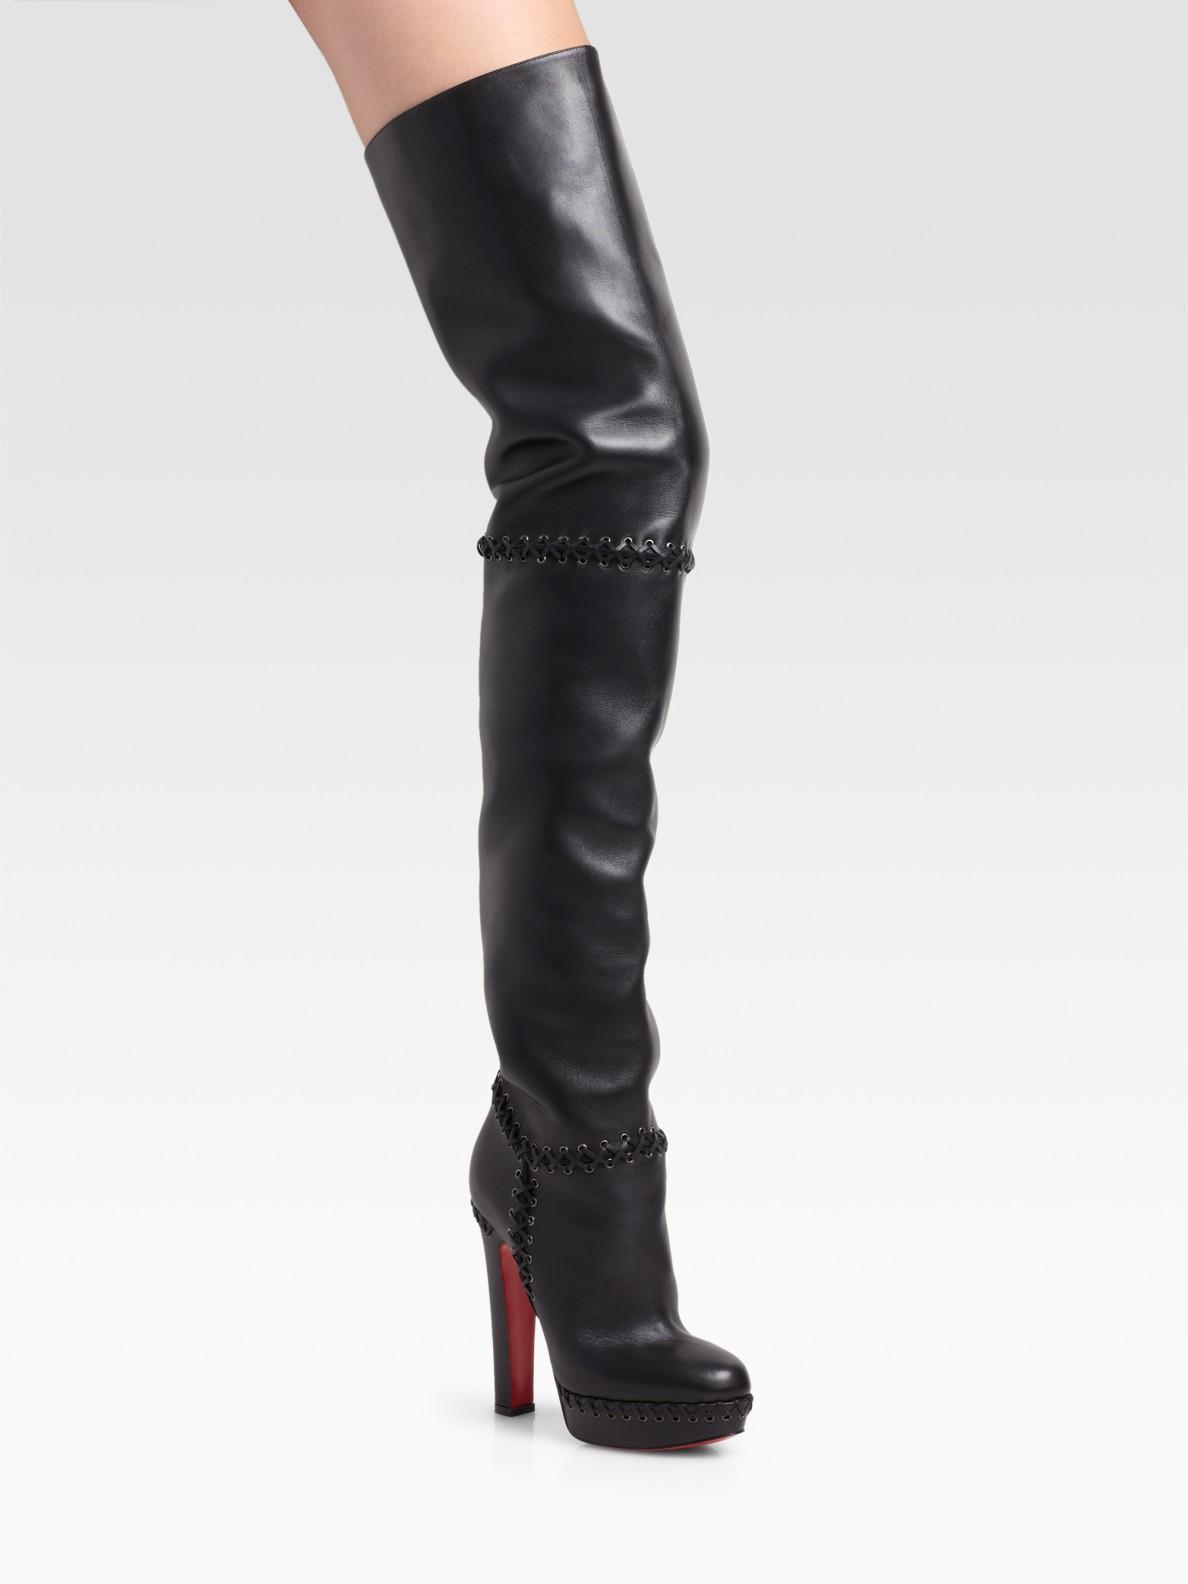 42cdaf3acae Christian Louboutin Black Tres Contente Thigh-high Boots